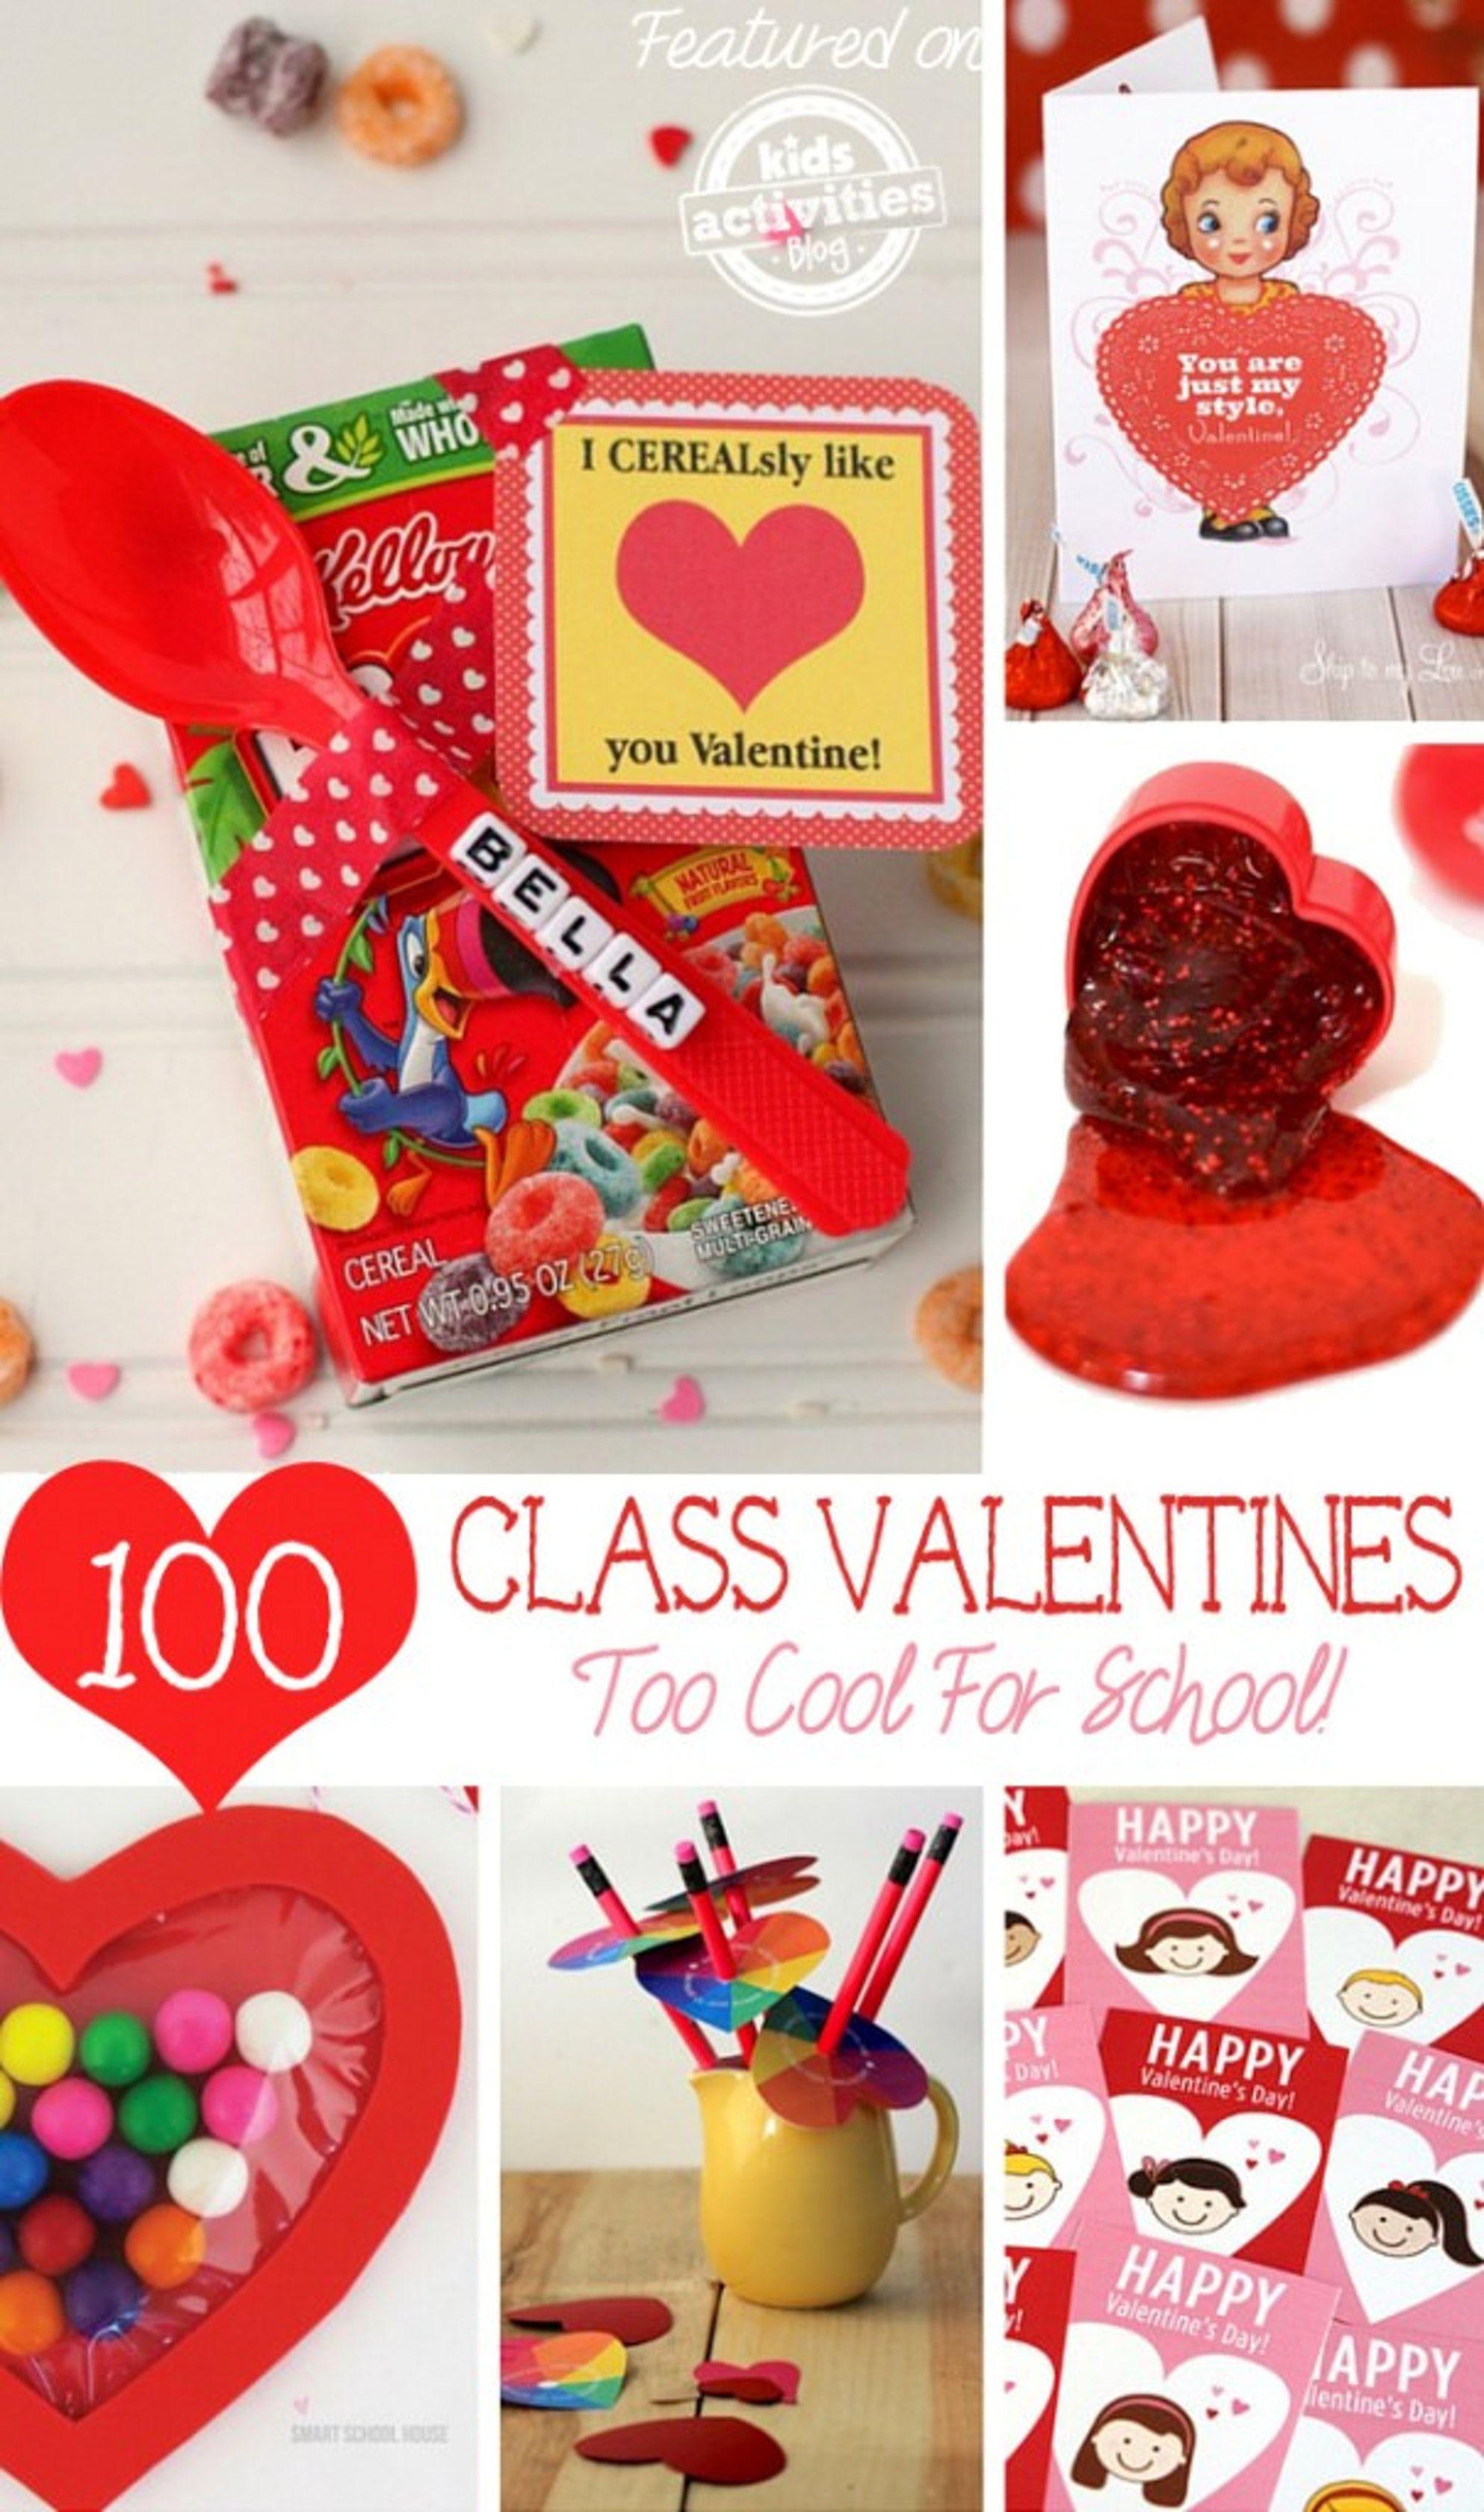 kids valentines for school kids activities - Valentine Kids